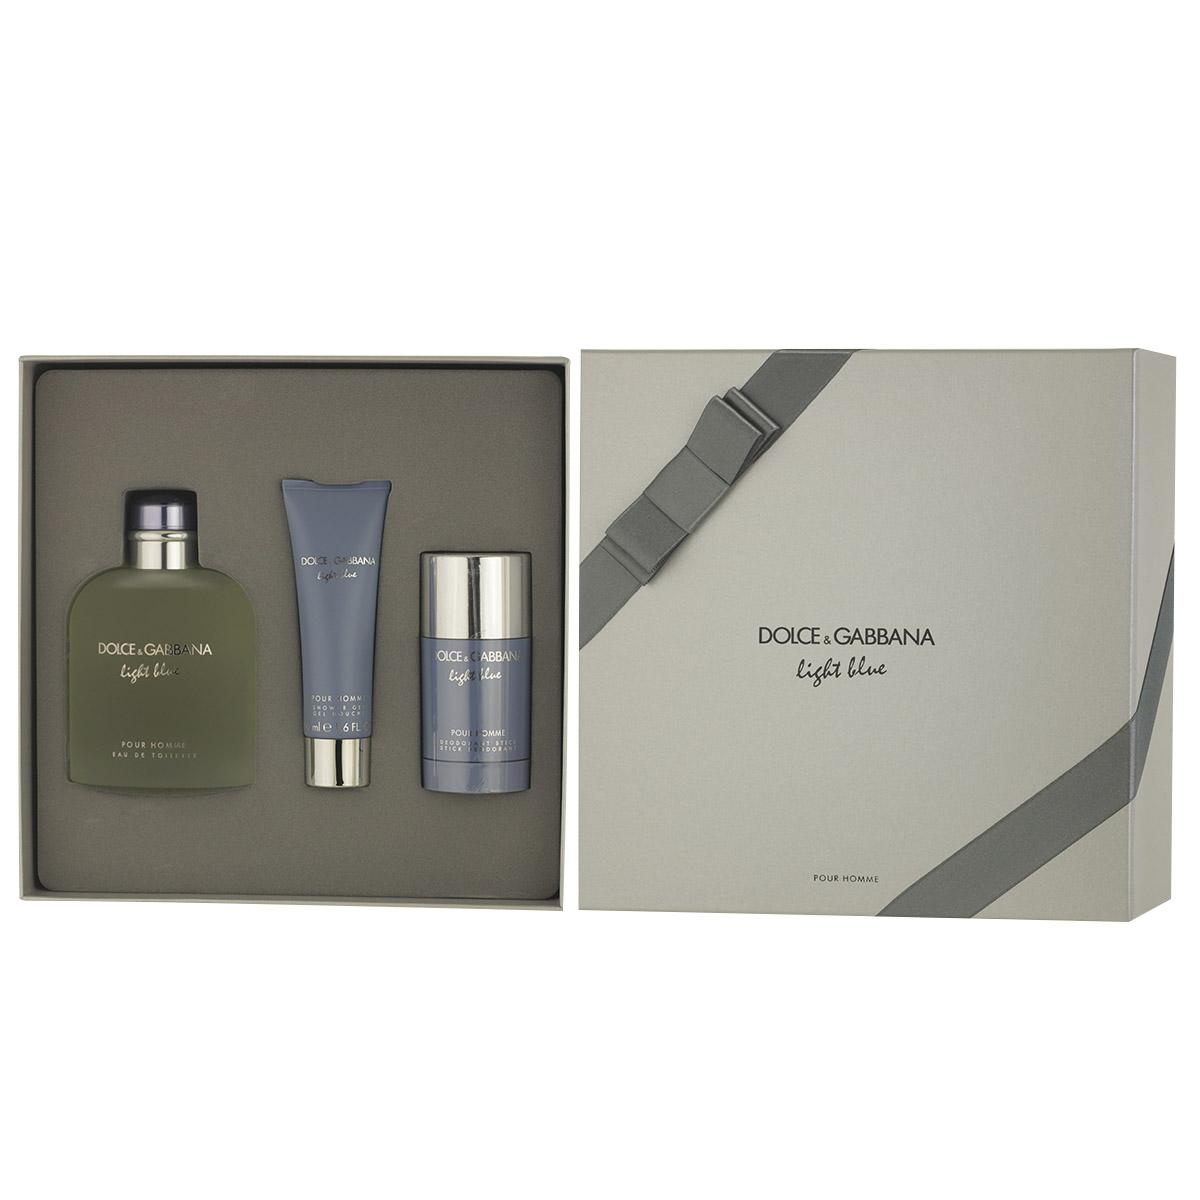 Dolce & Gabbana Light Blue pour Homme EDT 200 ml + DST 75 ml + SG 50 ml M